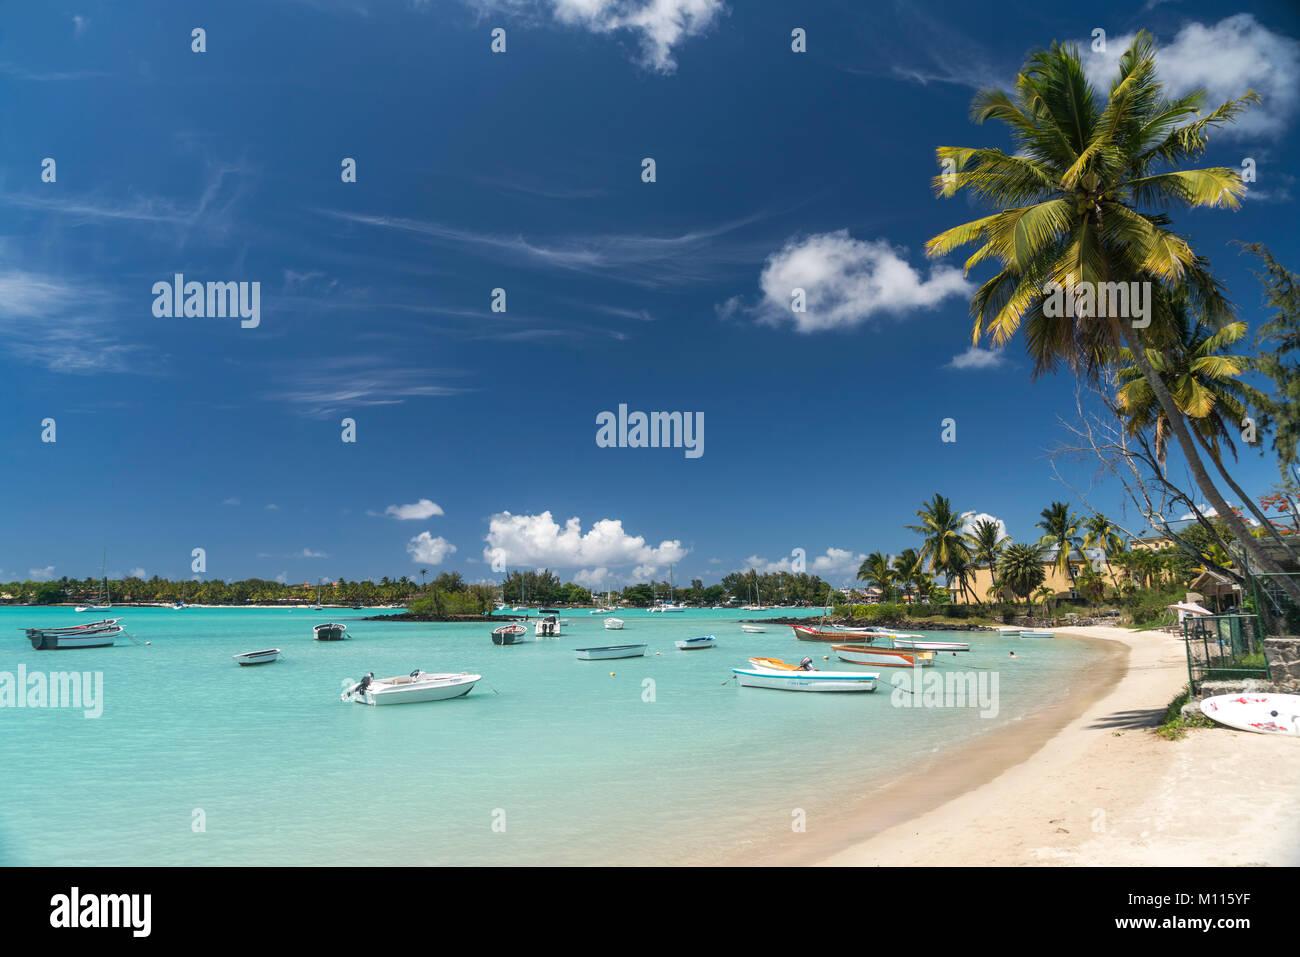 Grand Baie Mauritius Stock Photos & Grand Baie Mauritius